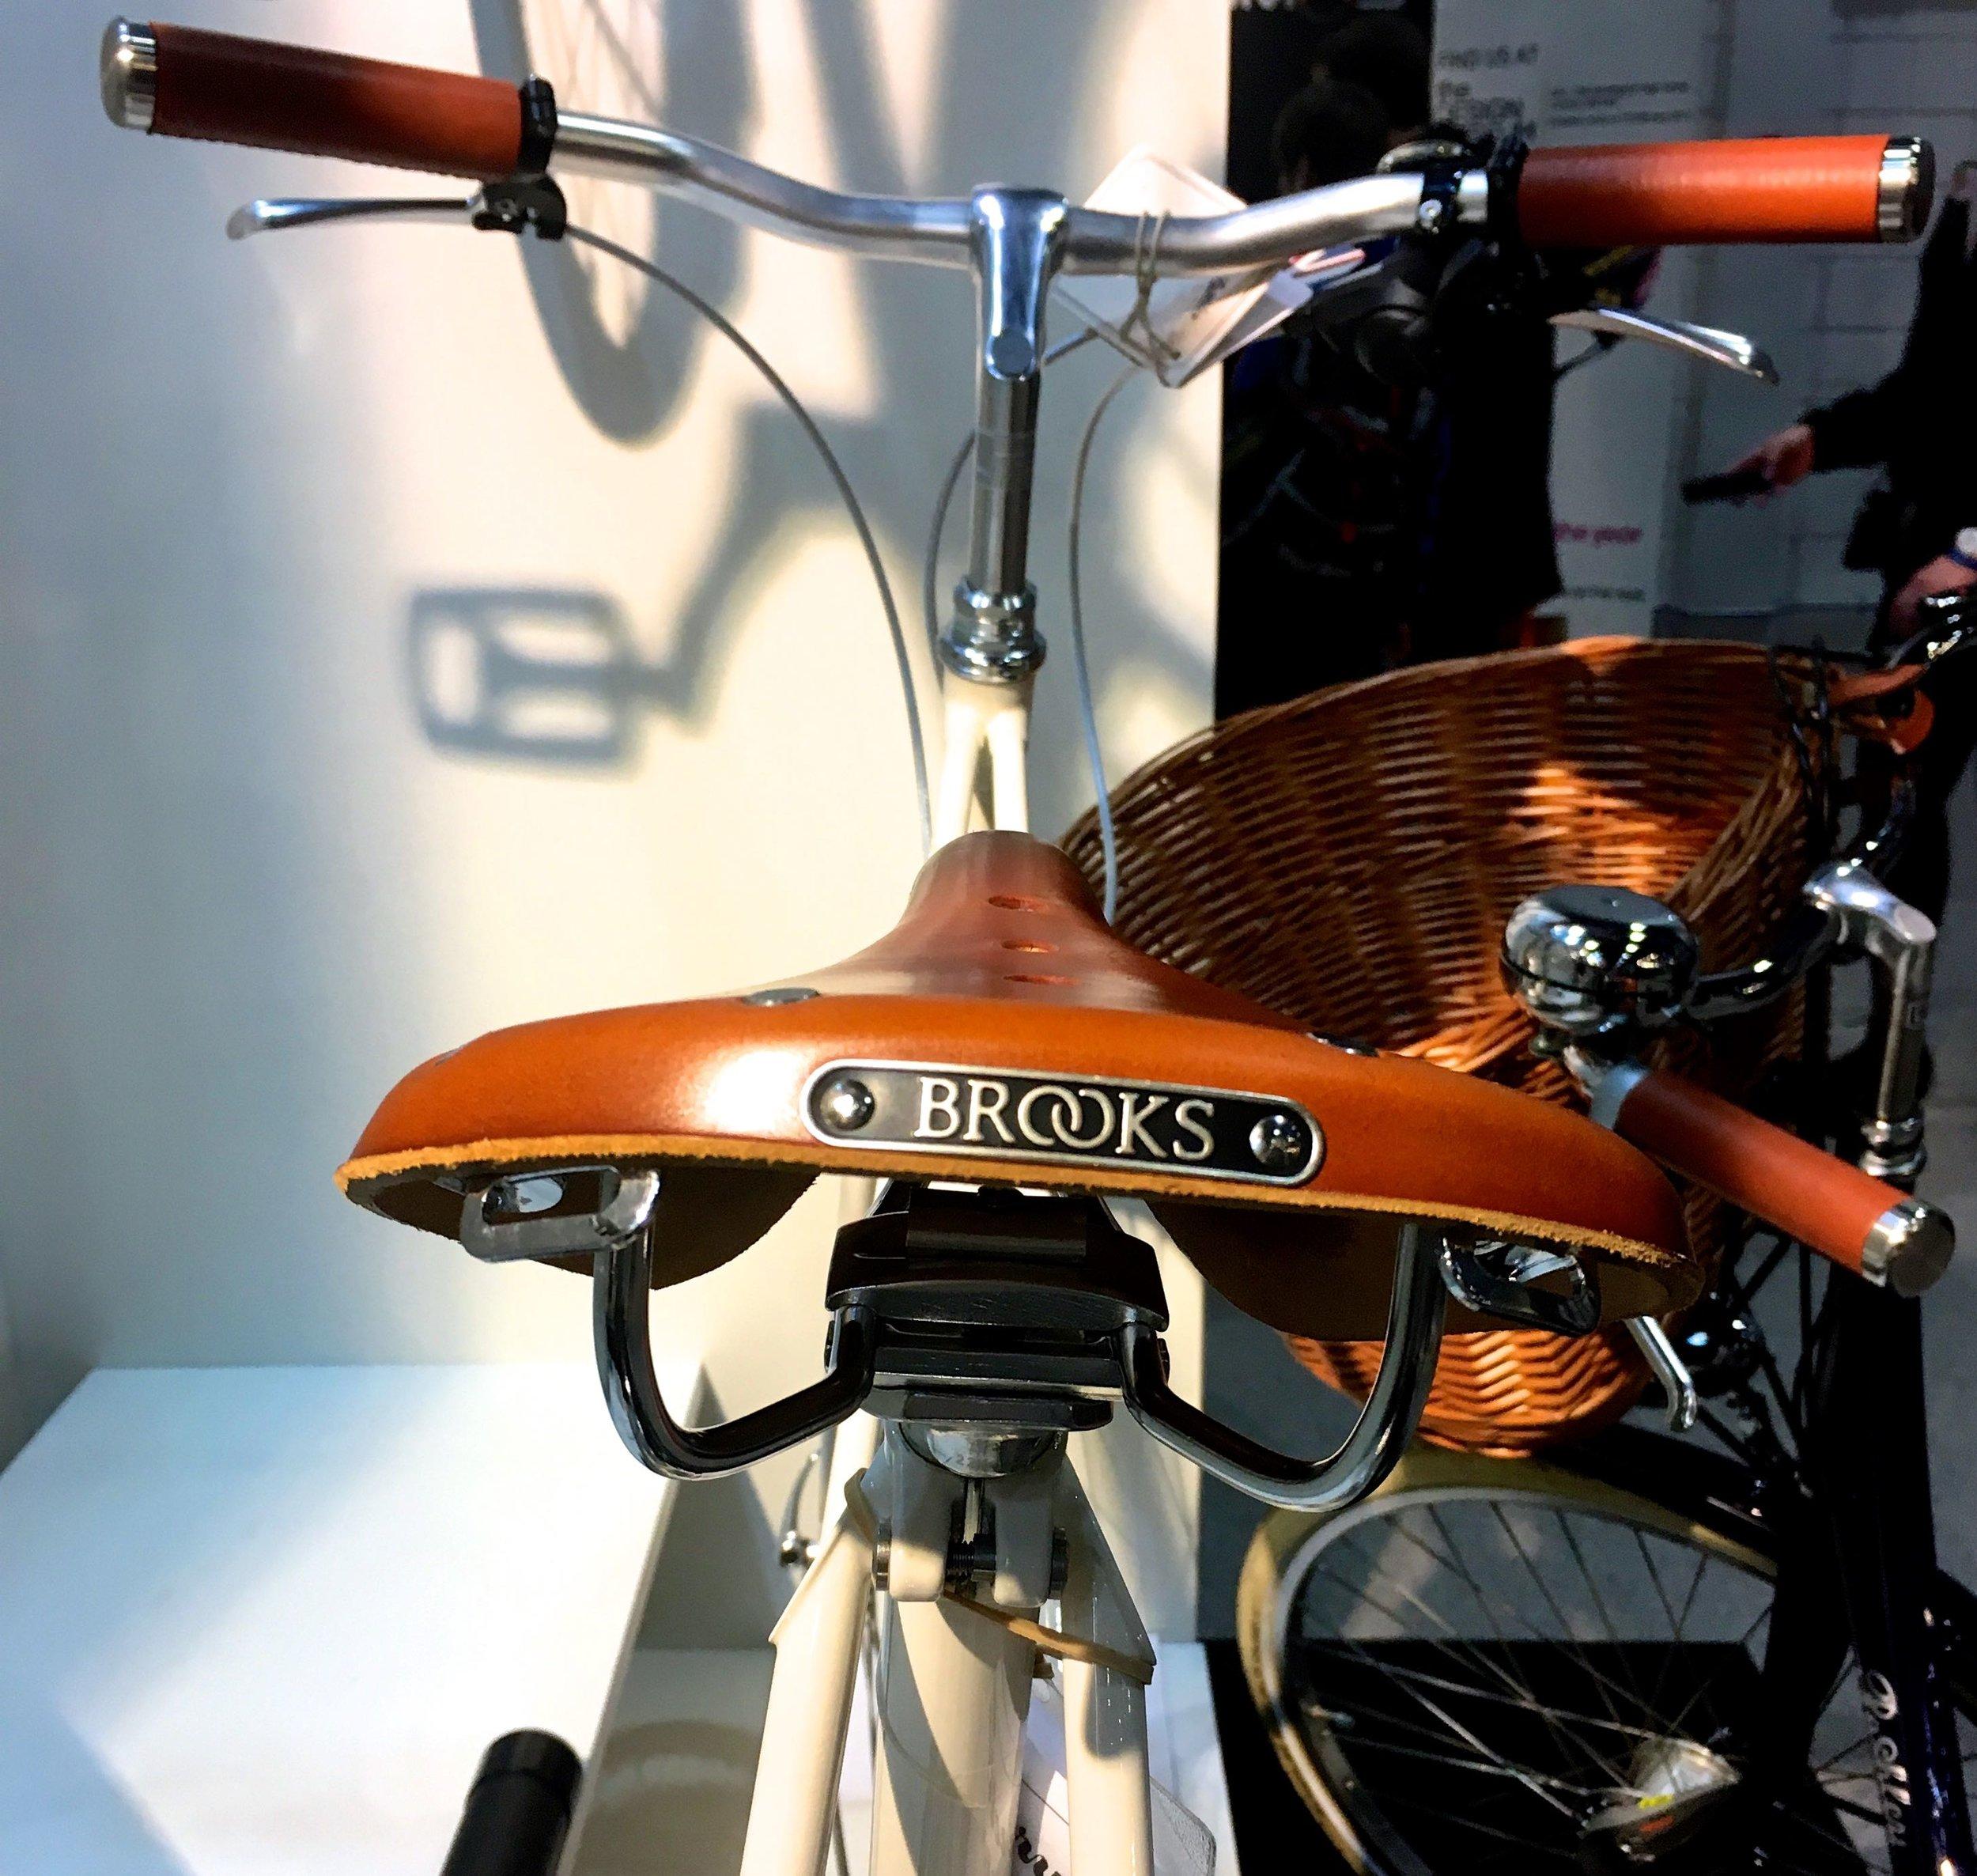 A Brooks saddle on a Pashley bike at the London Bike Show